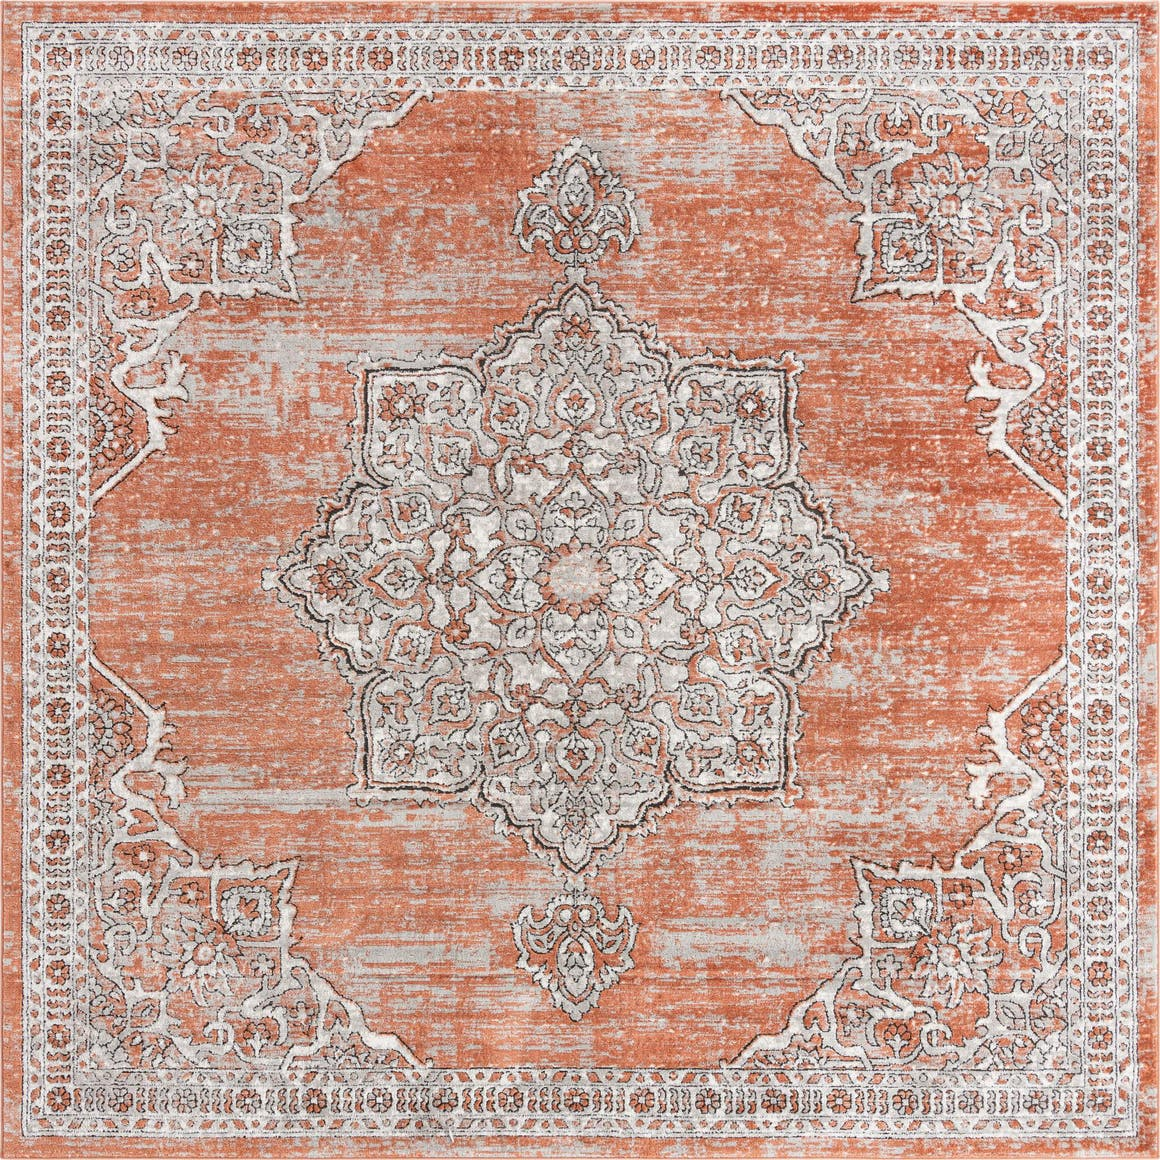 10' x 10' Nyla Square Rug main image